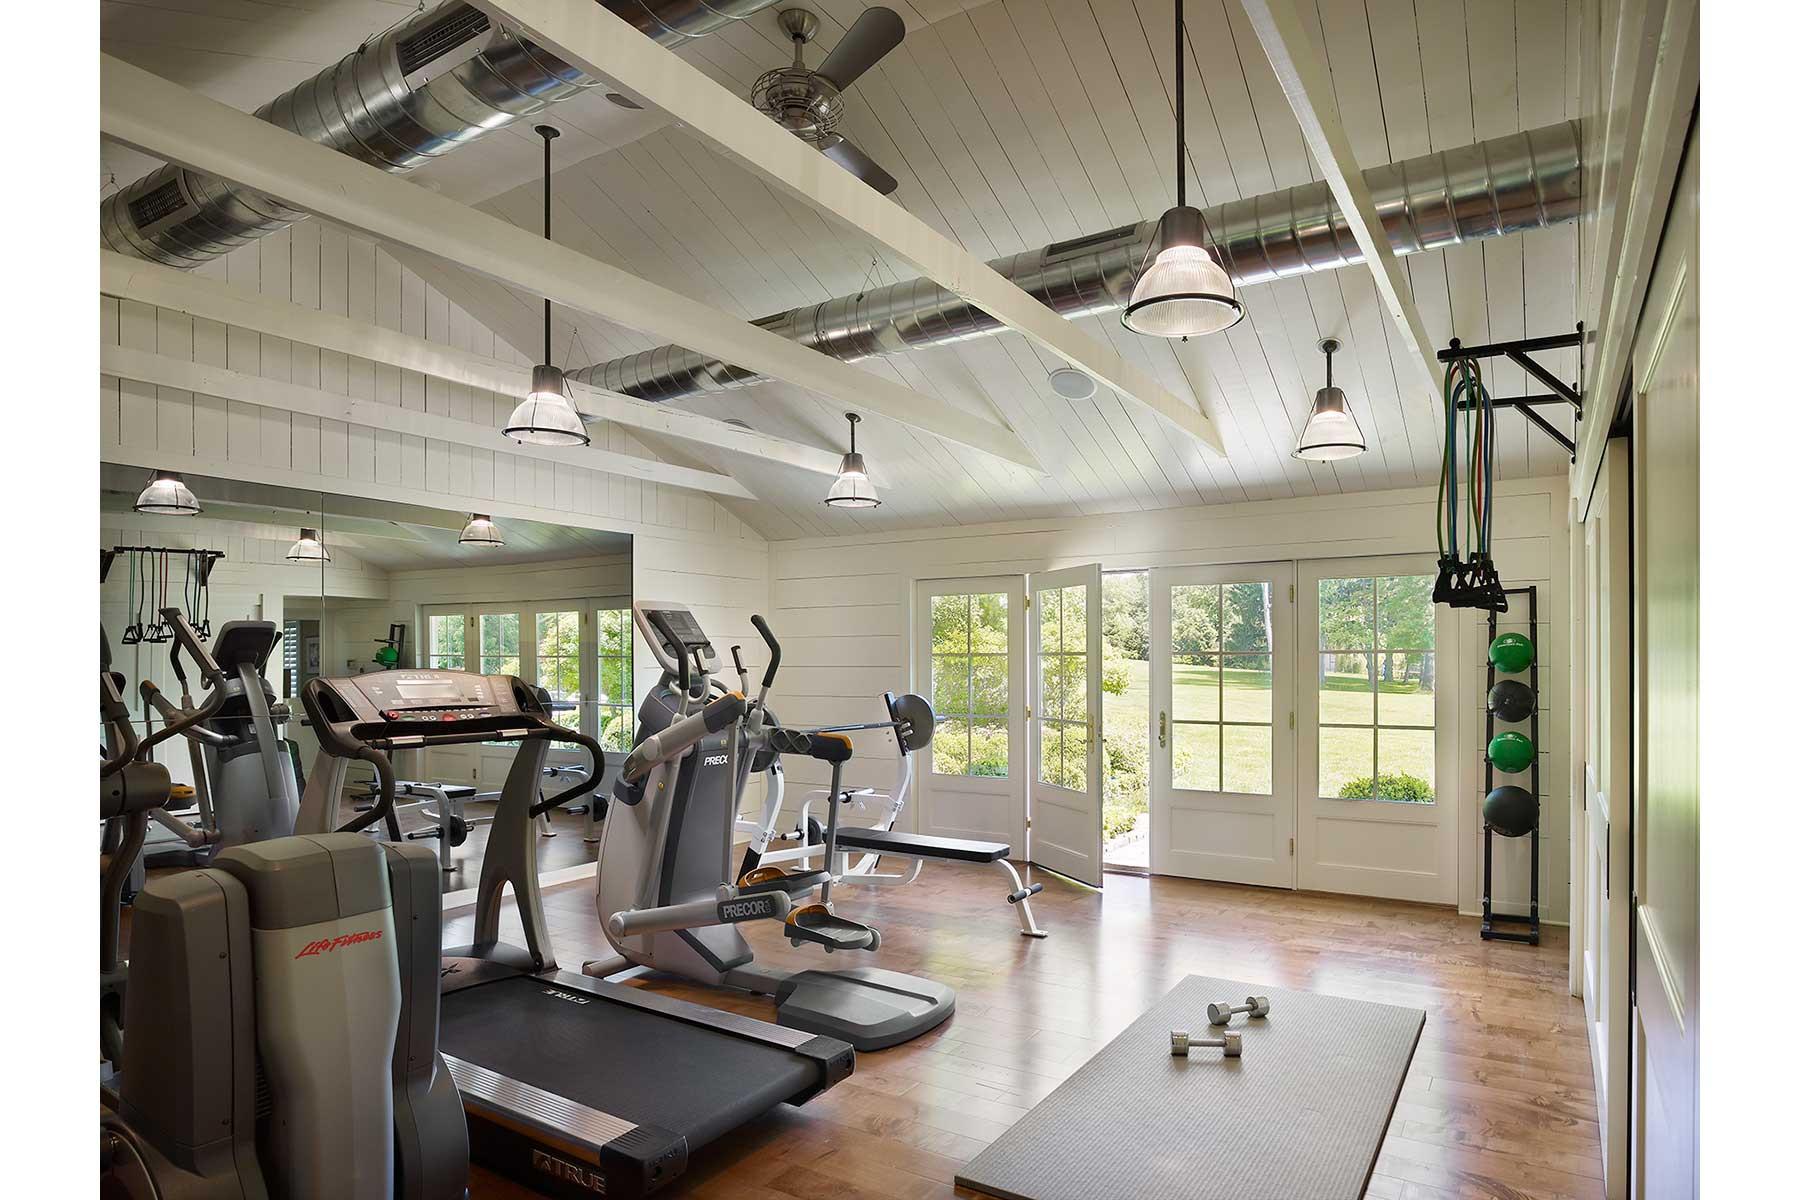 08-gym